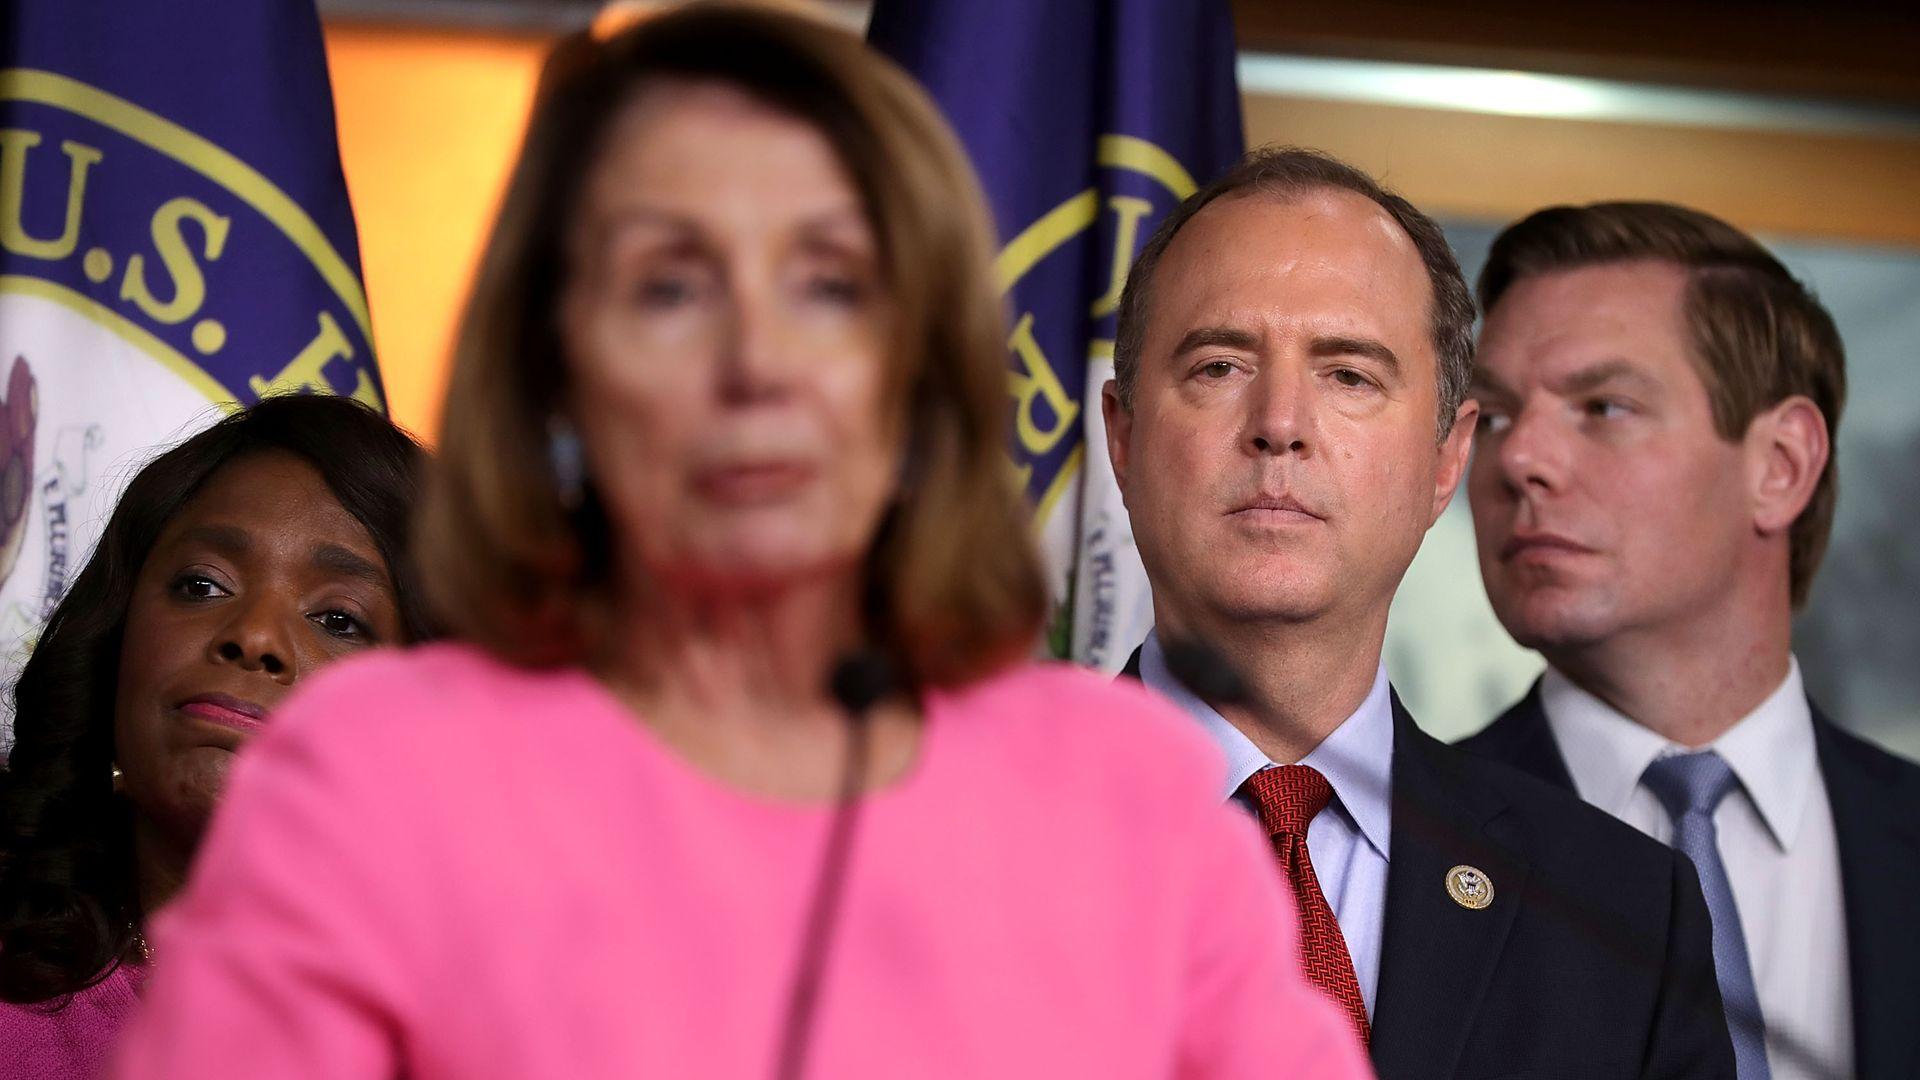 Nancy Pelosi, Adam Schiff and Eric Swalwell